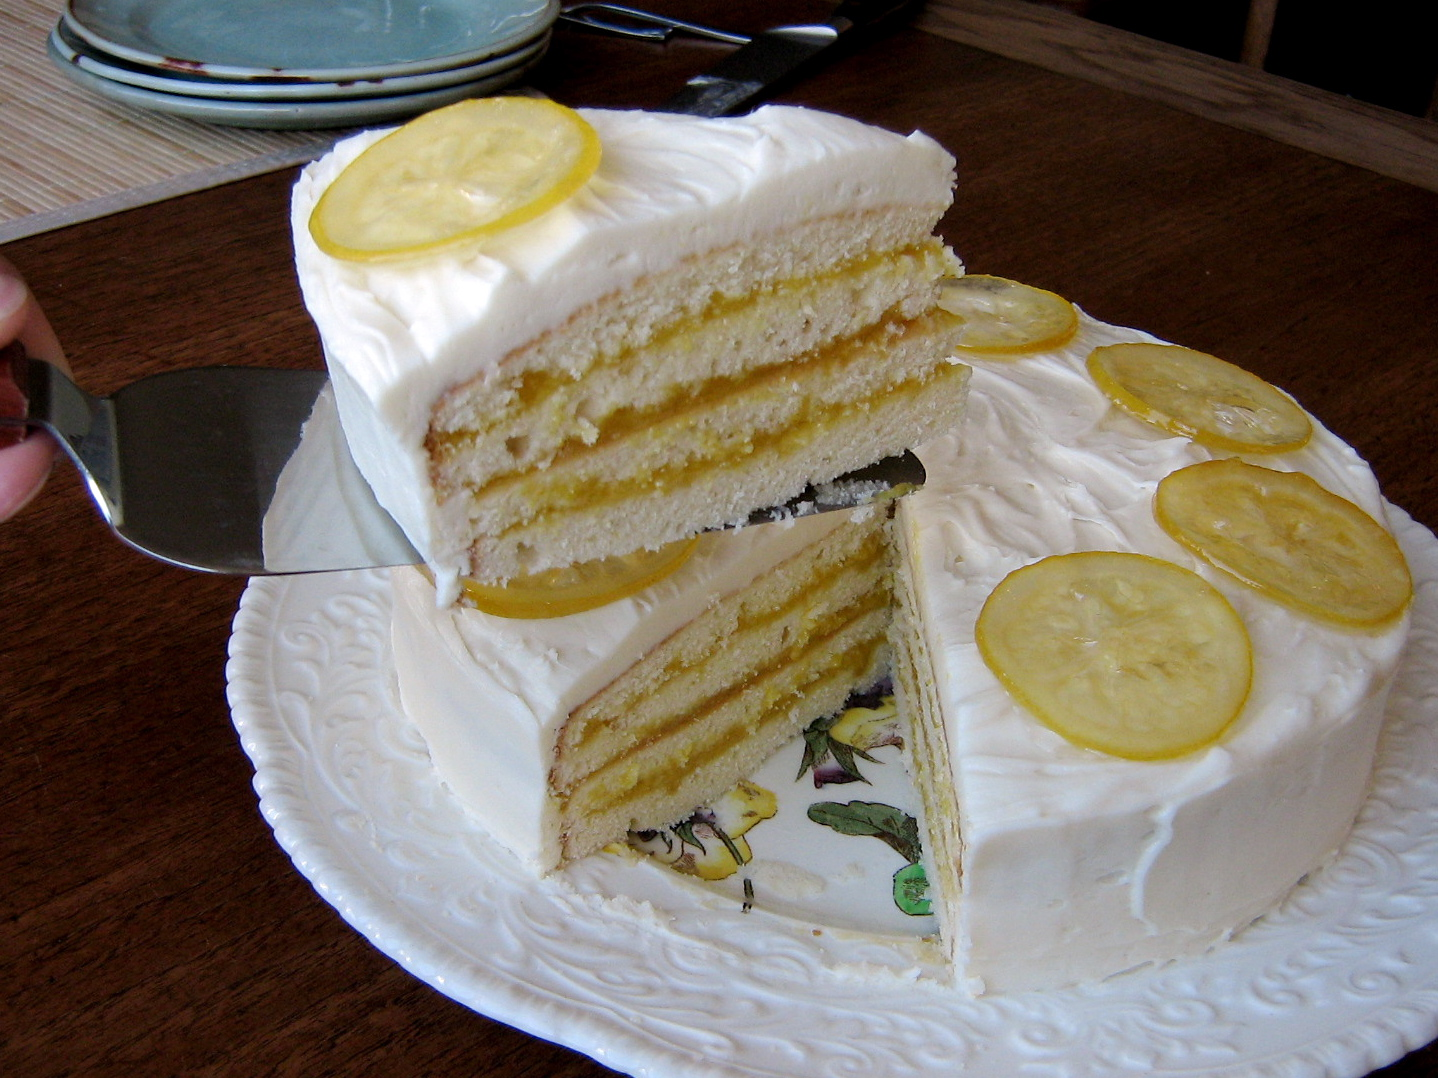 Awe Inspiring Lemon Tastic Birthday Cake With Lemon Curd Filling And Candied Personalised Birthday Cards Beptaeletsinfo